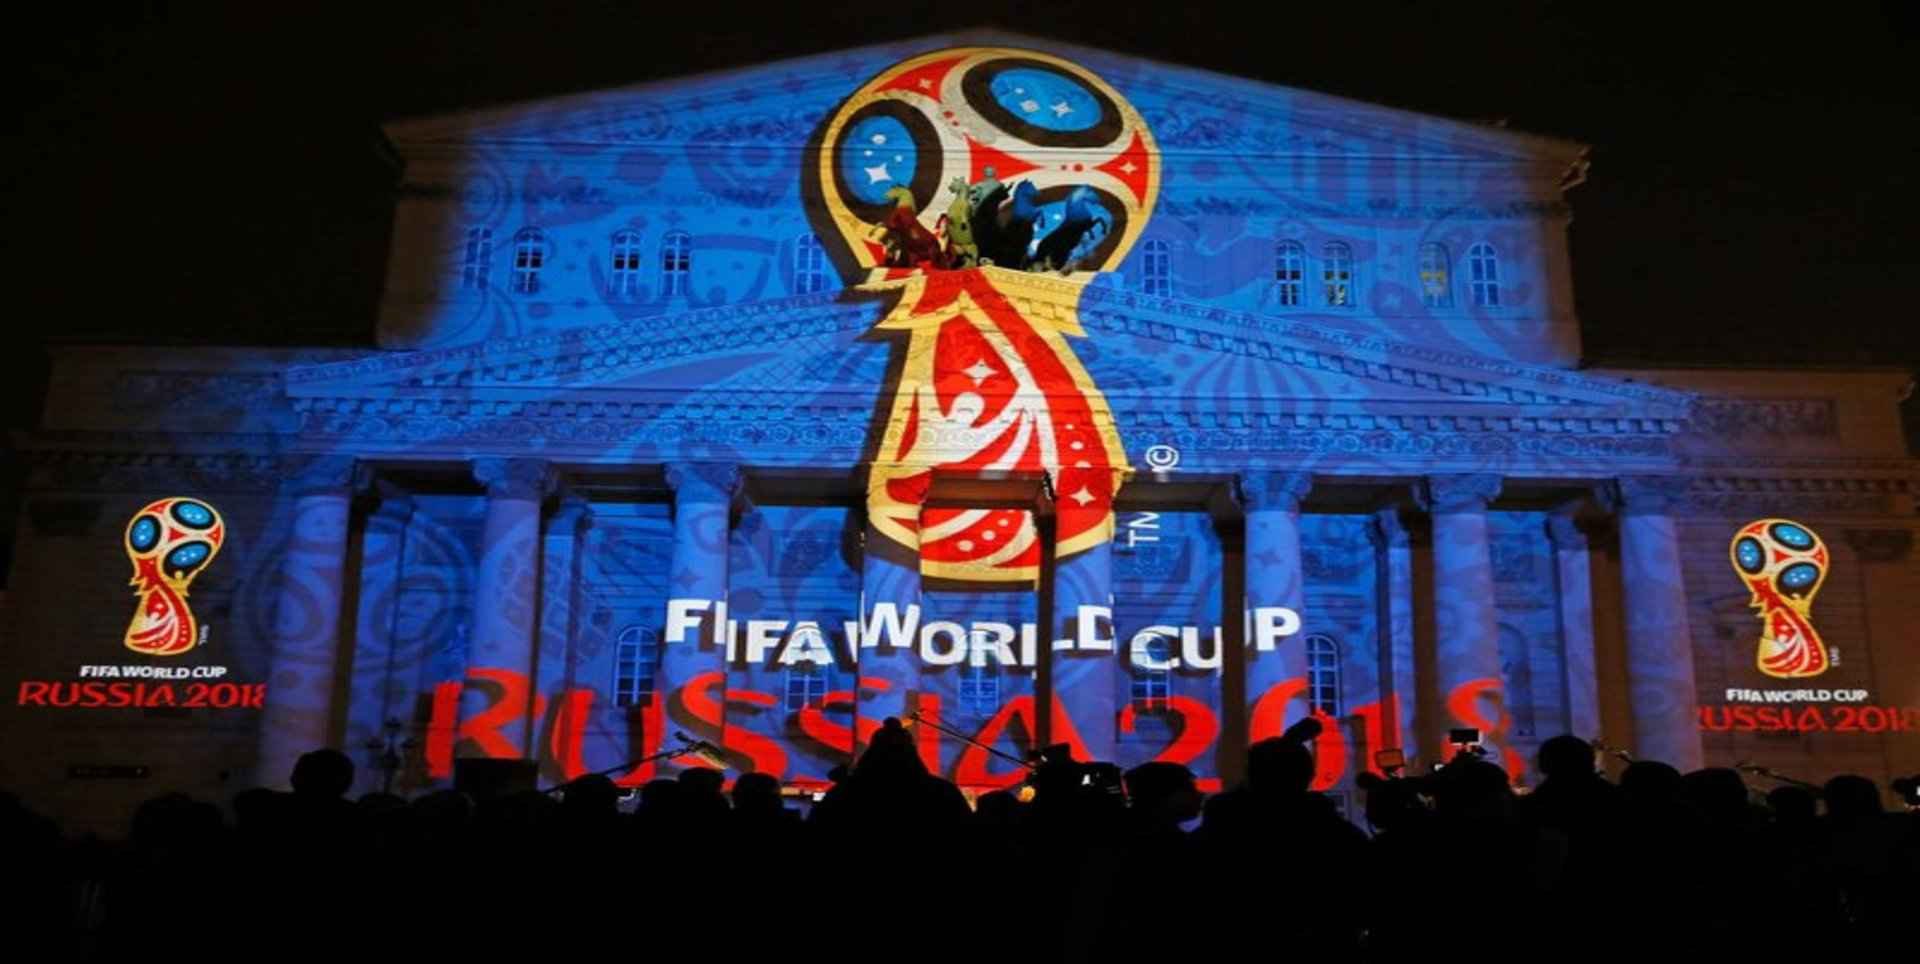 FIFA WC Republic of Ireland V Serbia Live